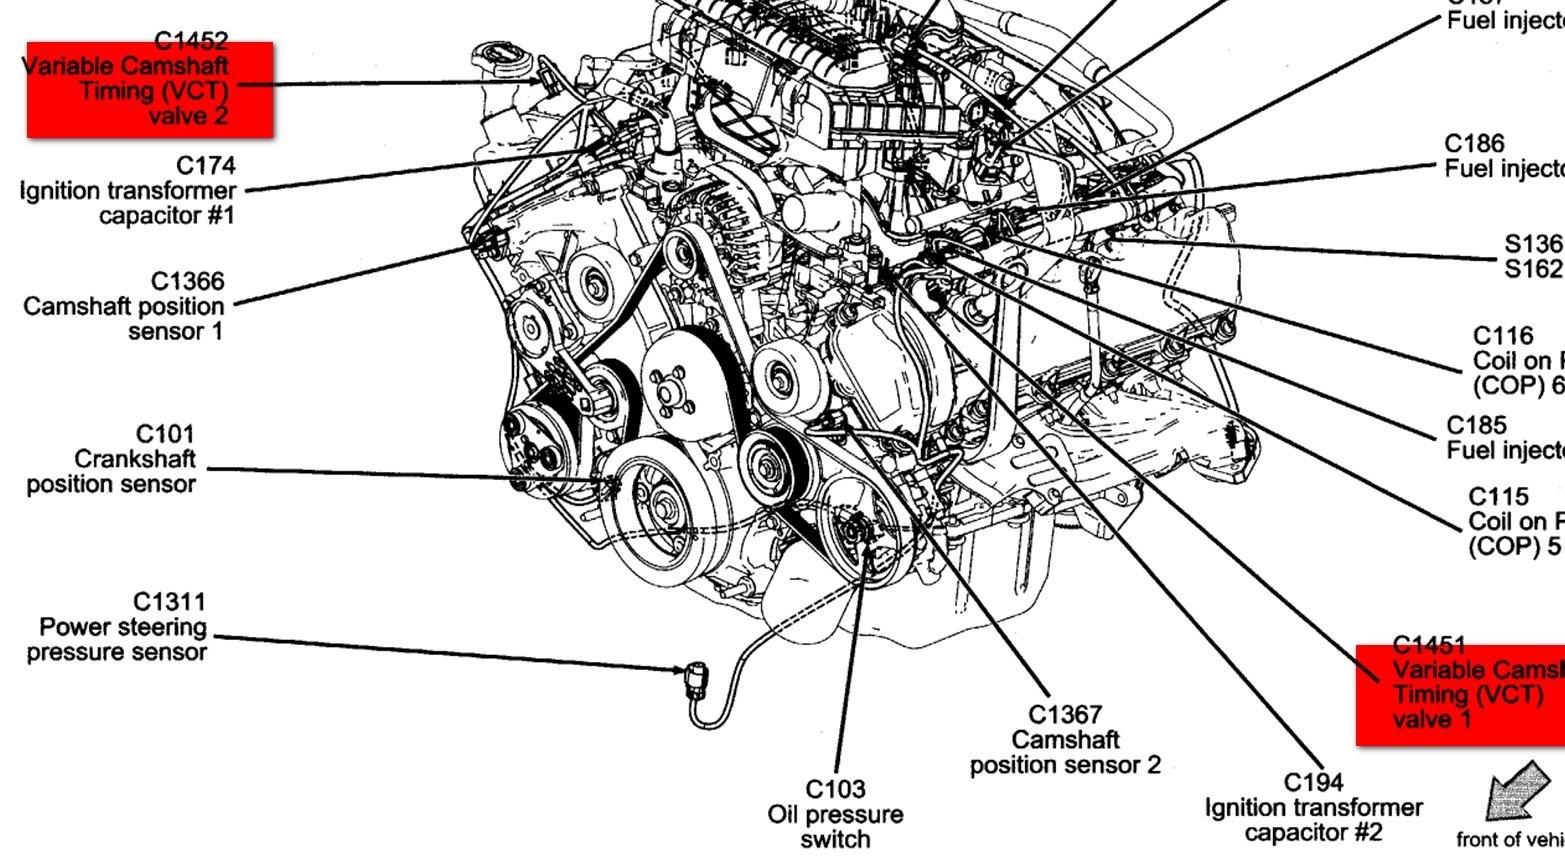 2005 ford 5.4 3v Engine Wiring Harness Diagram 54 Triton Firing order Diagram Drivenheisenberg Of 2005 ford 5.4 3v Engine Wiring Harness Diagram